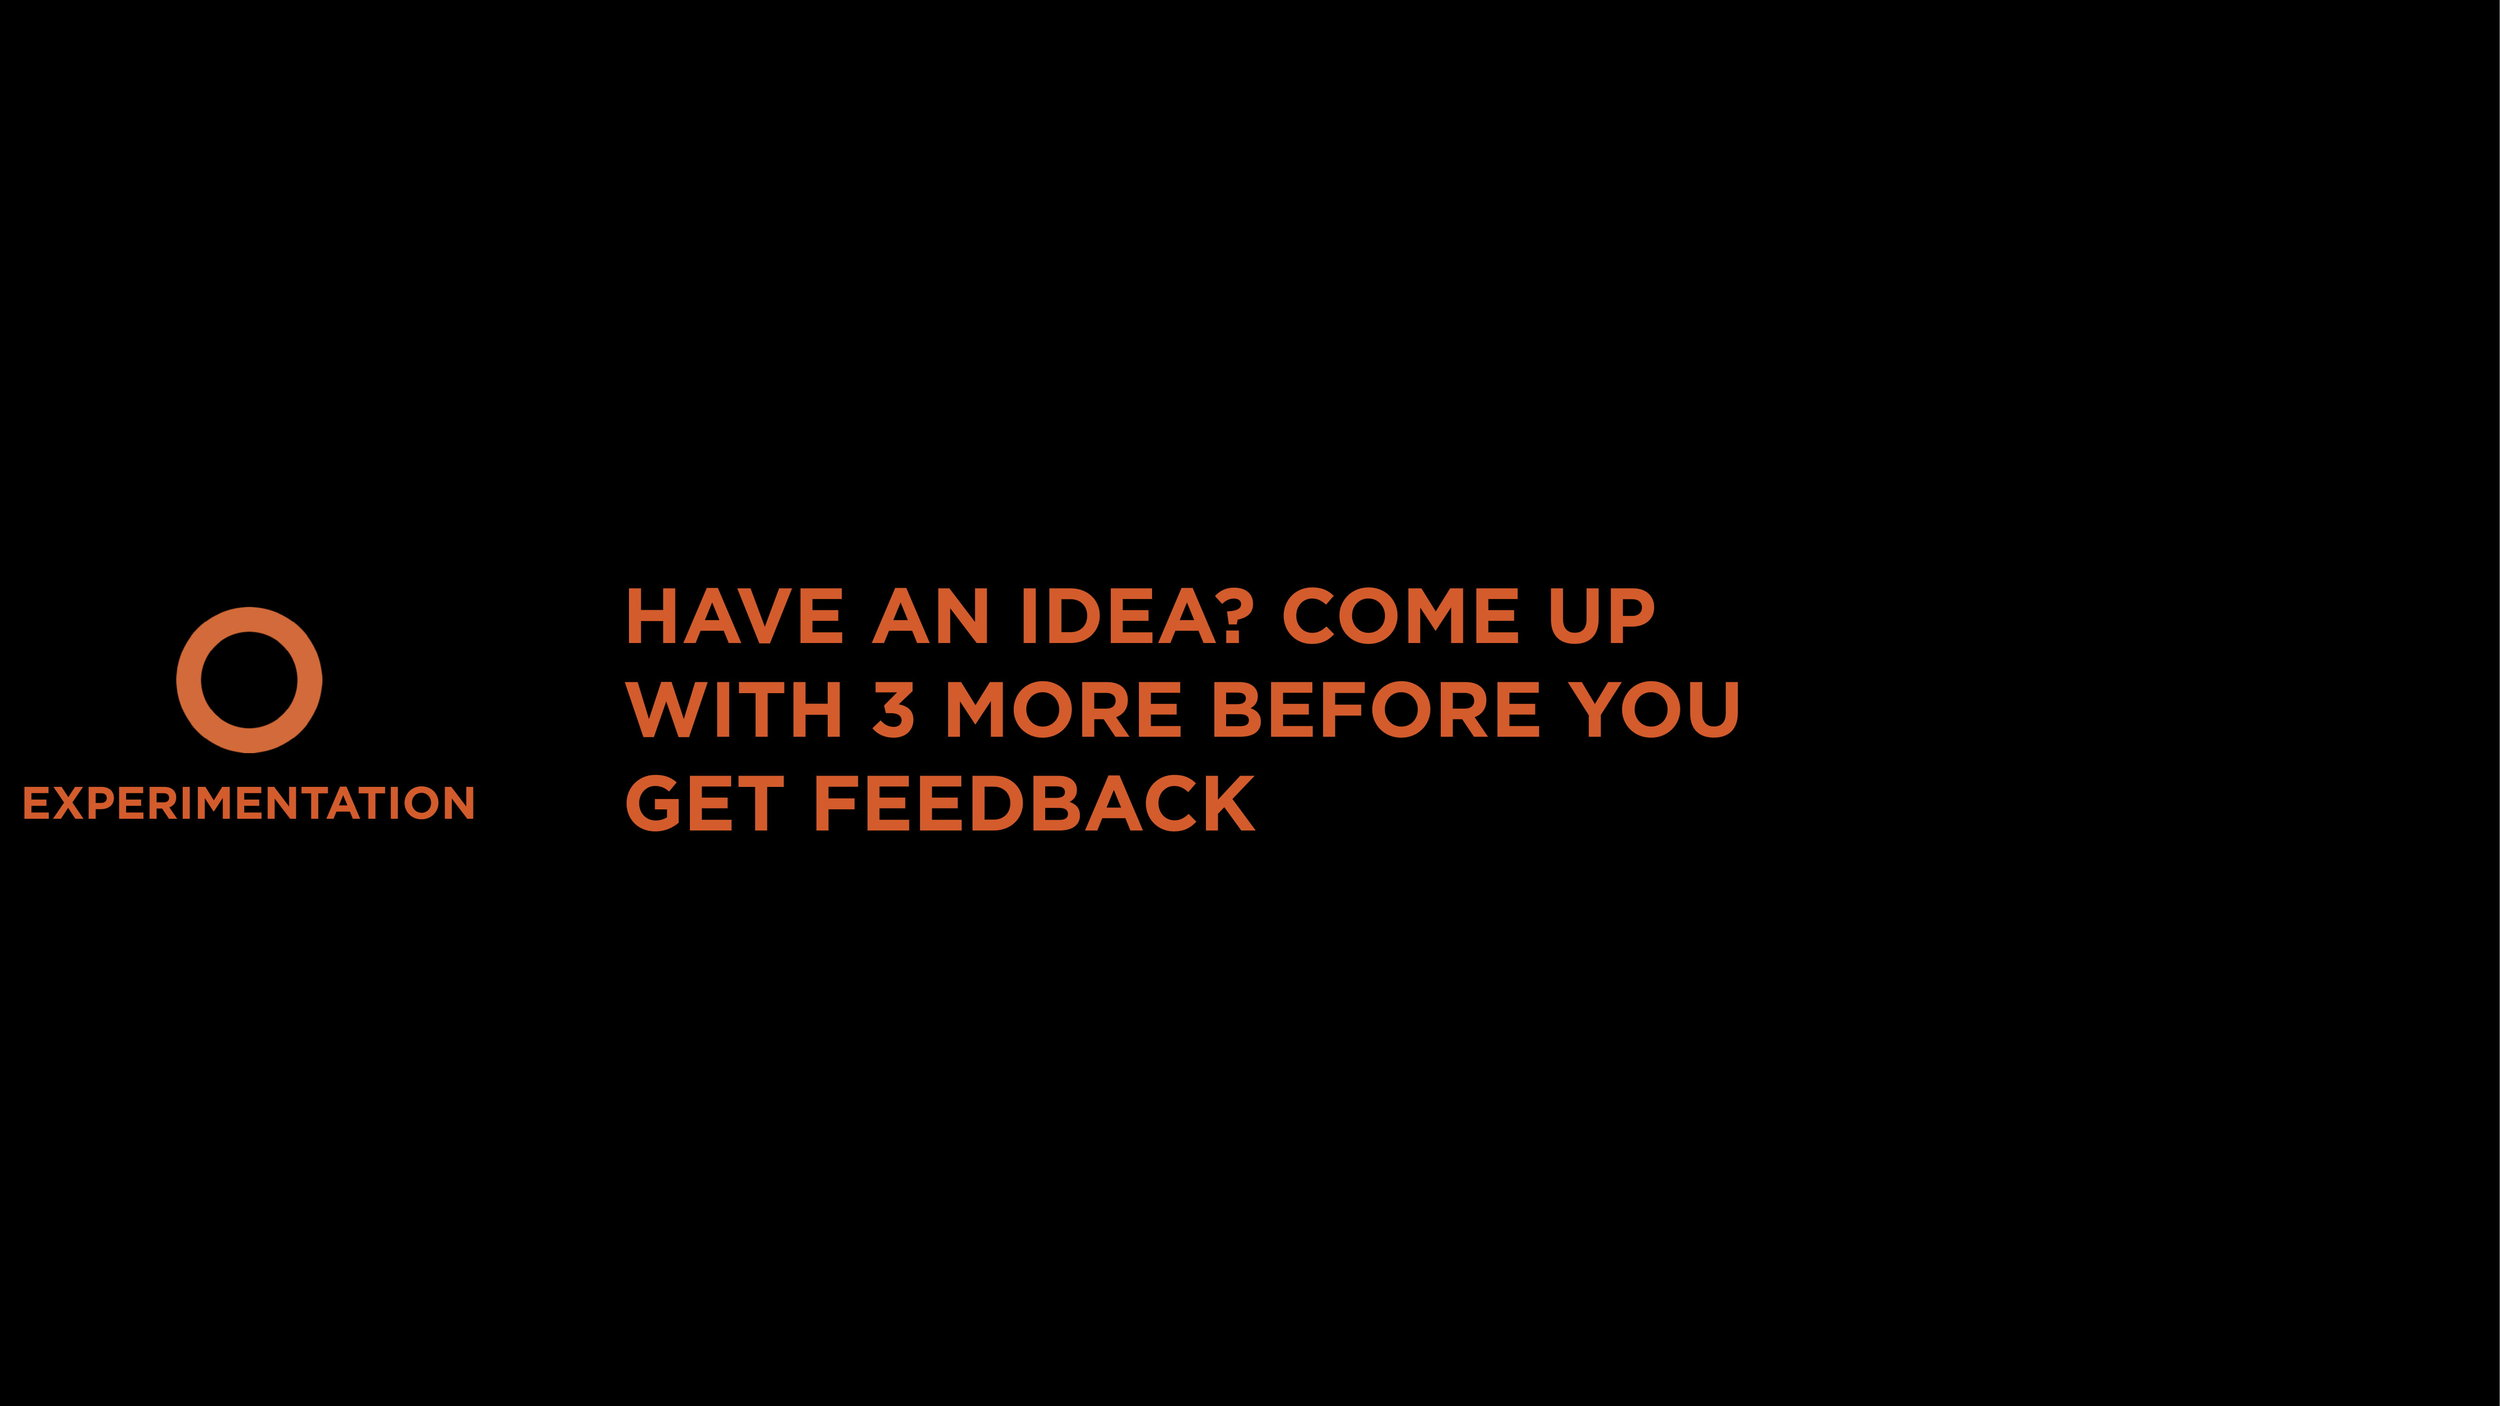 IDEO_CultureSummit_JL_v2-16.jpg